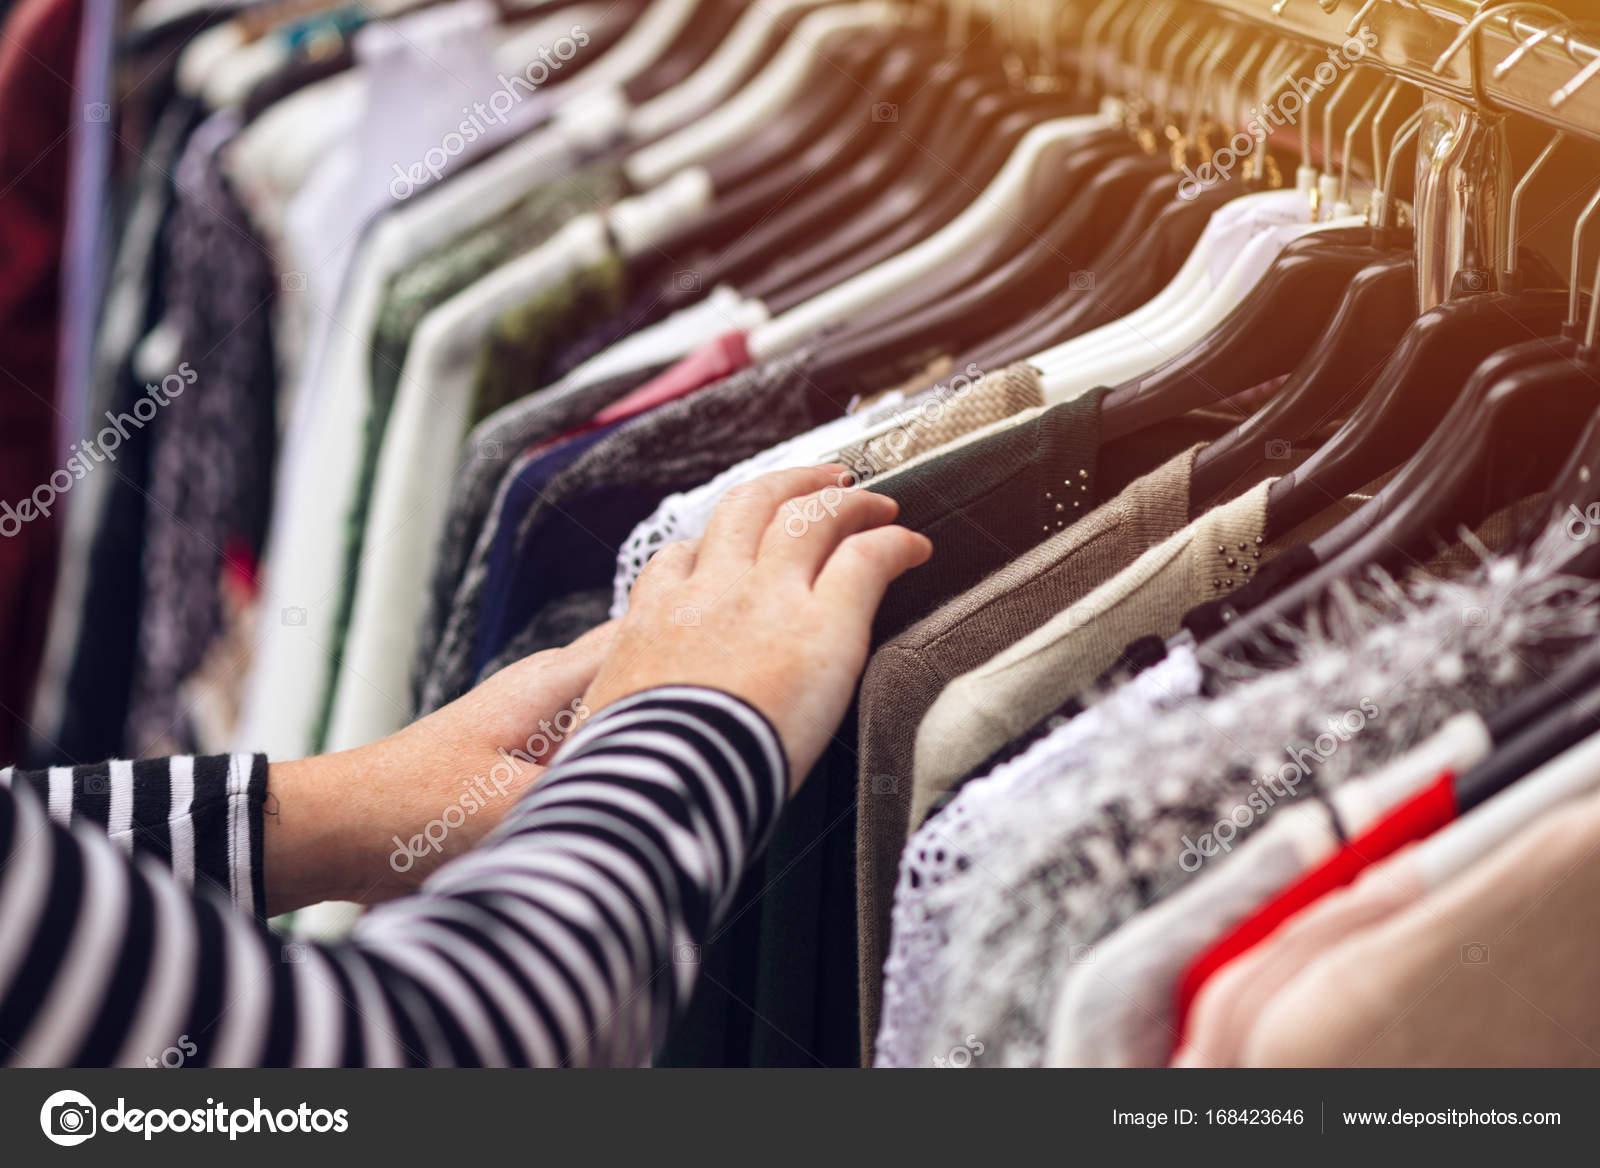 07384c0a905d Γυναίκα περιήγηση μέσα από ρούχα από δεύτερο χέρι λαϊκή αγορά– εικόνα  αρχείου